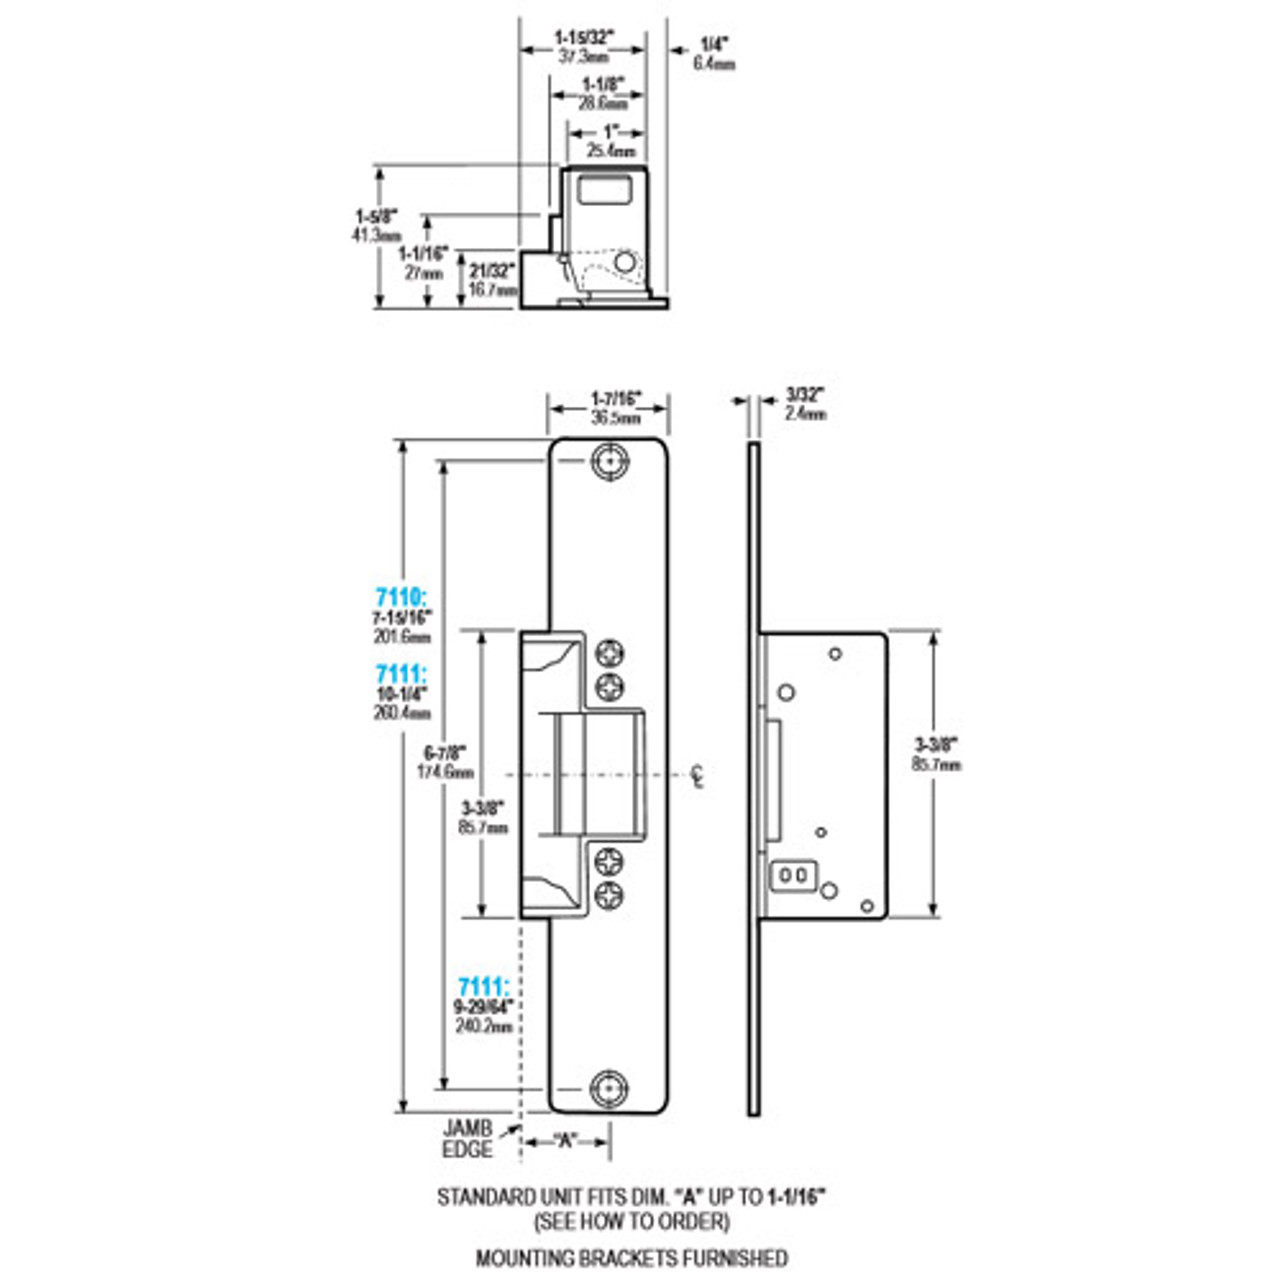 7110-540-652 Adams Rite Electric Strike 24VAC Fail Secure in Satin on